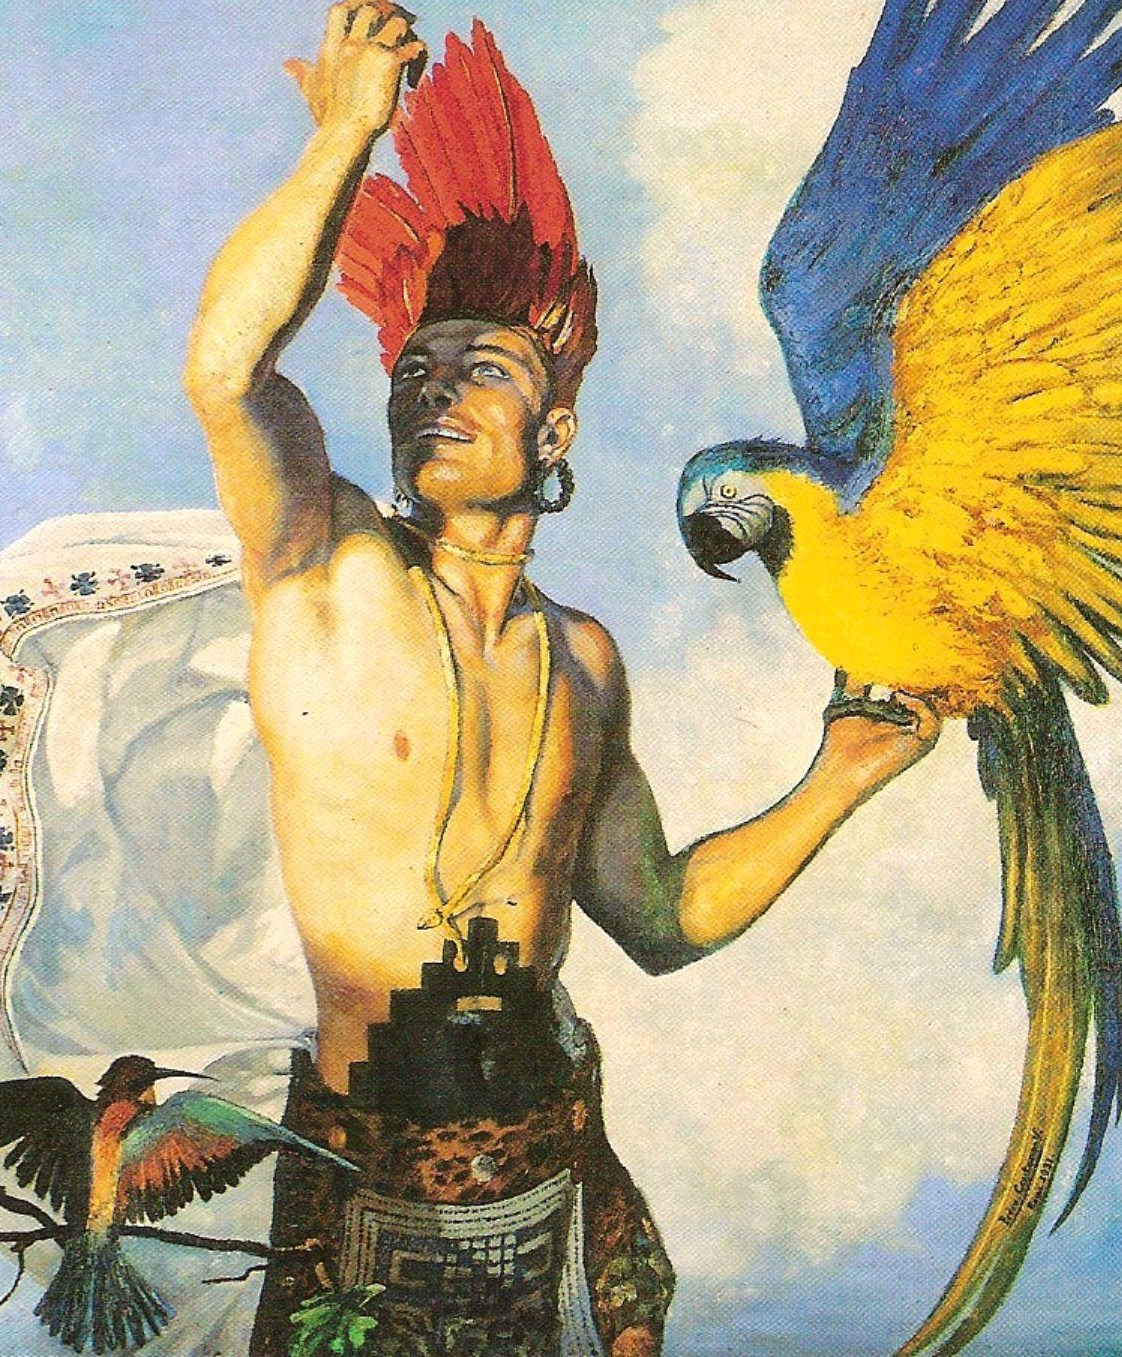 El Portafolio del Arte: Pedro Centeno Vallenilla